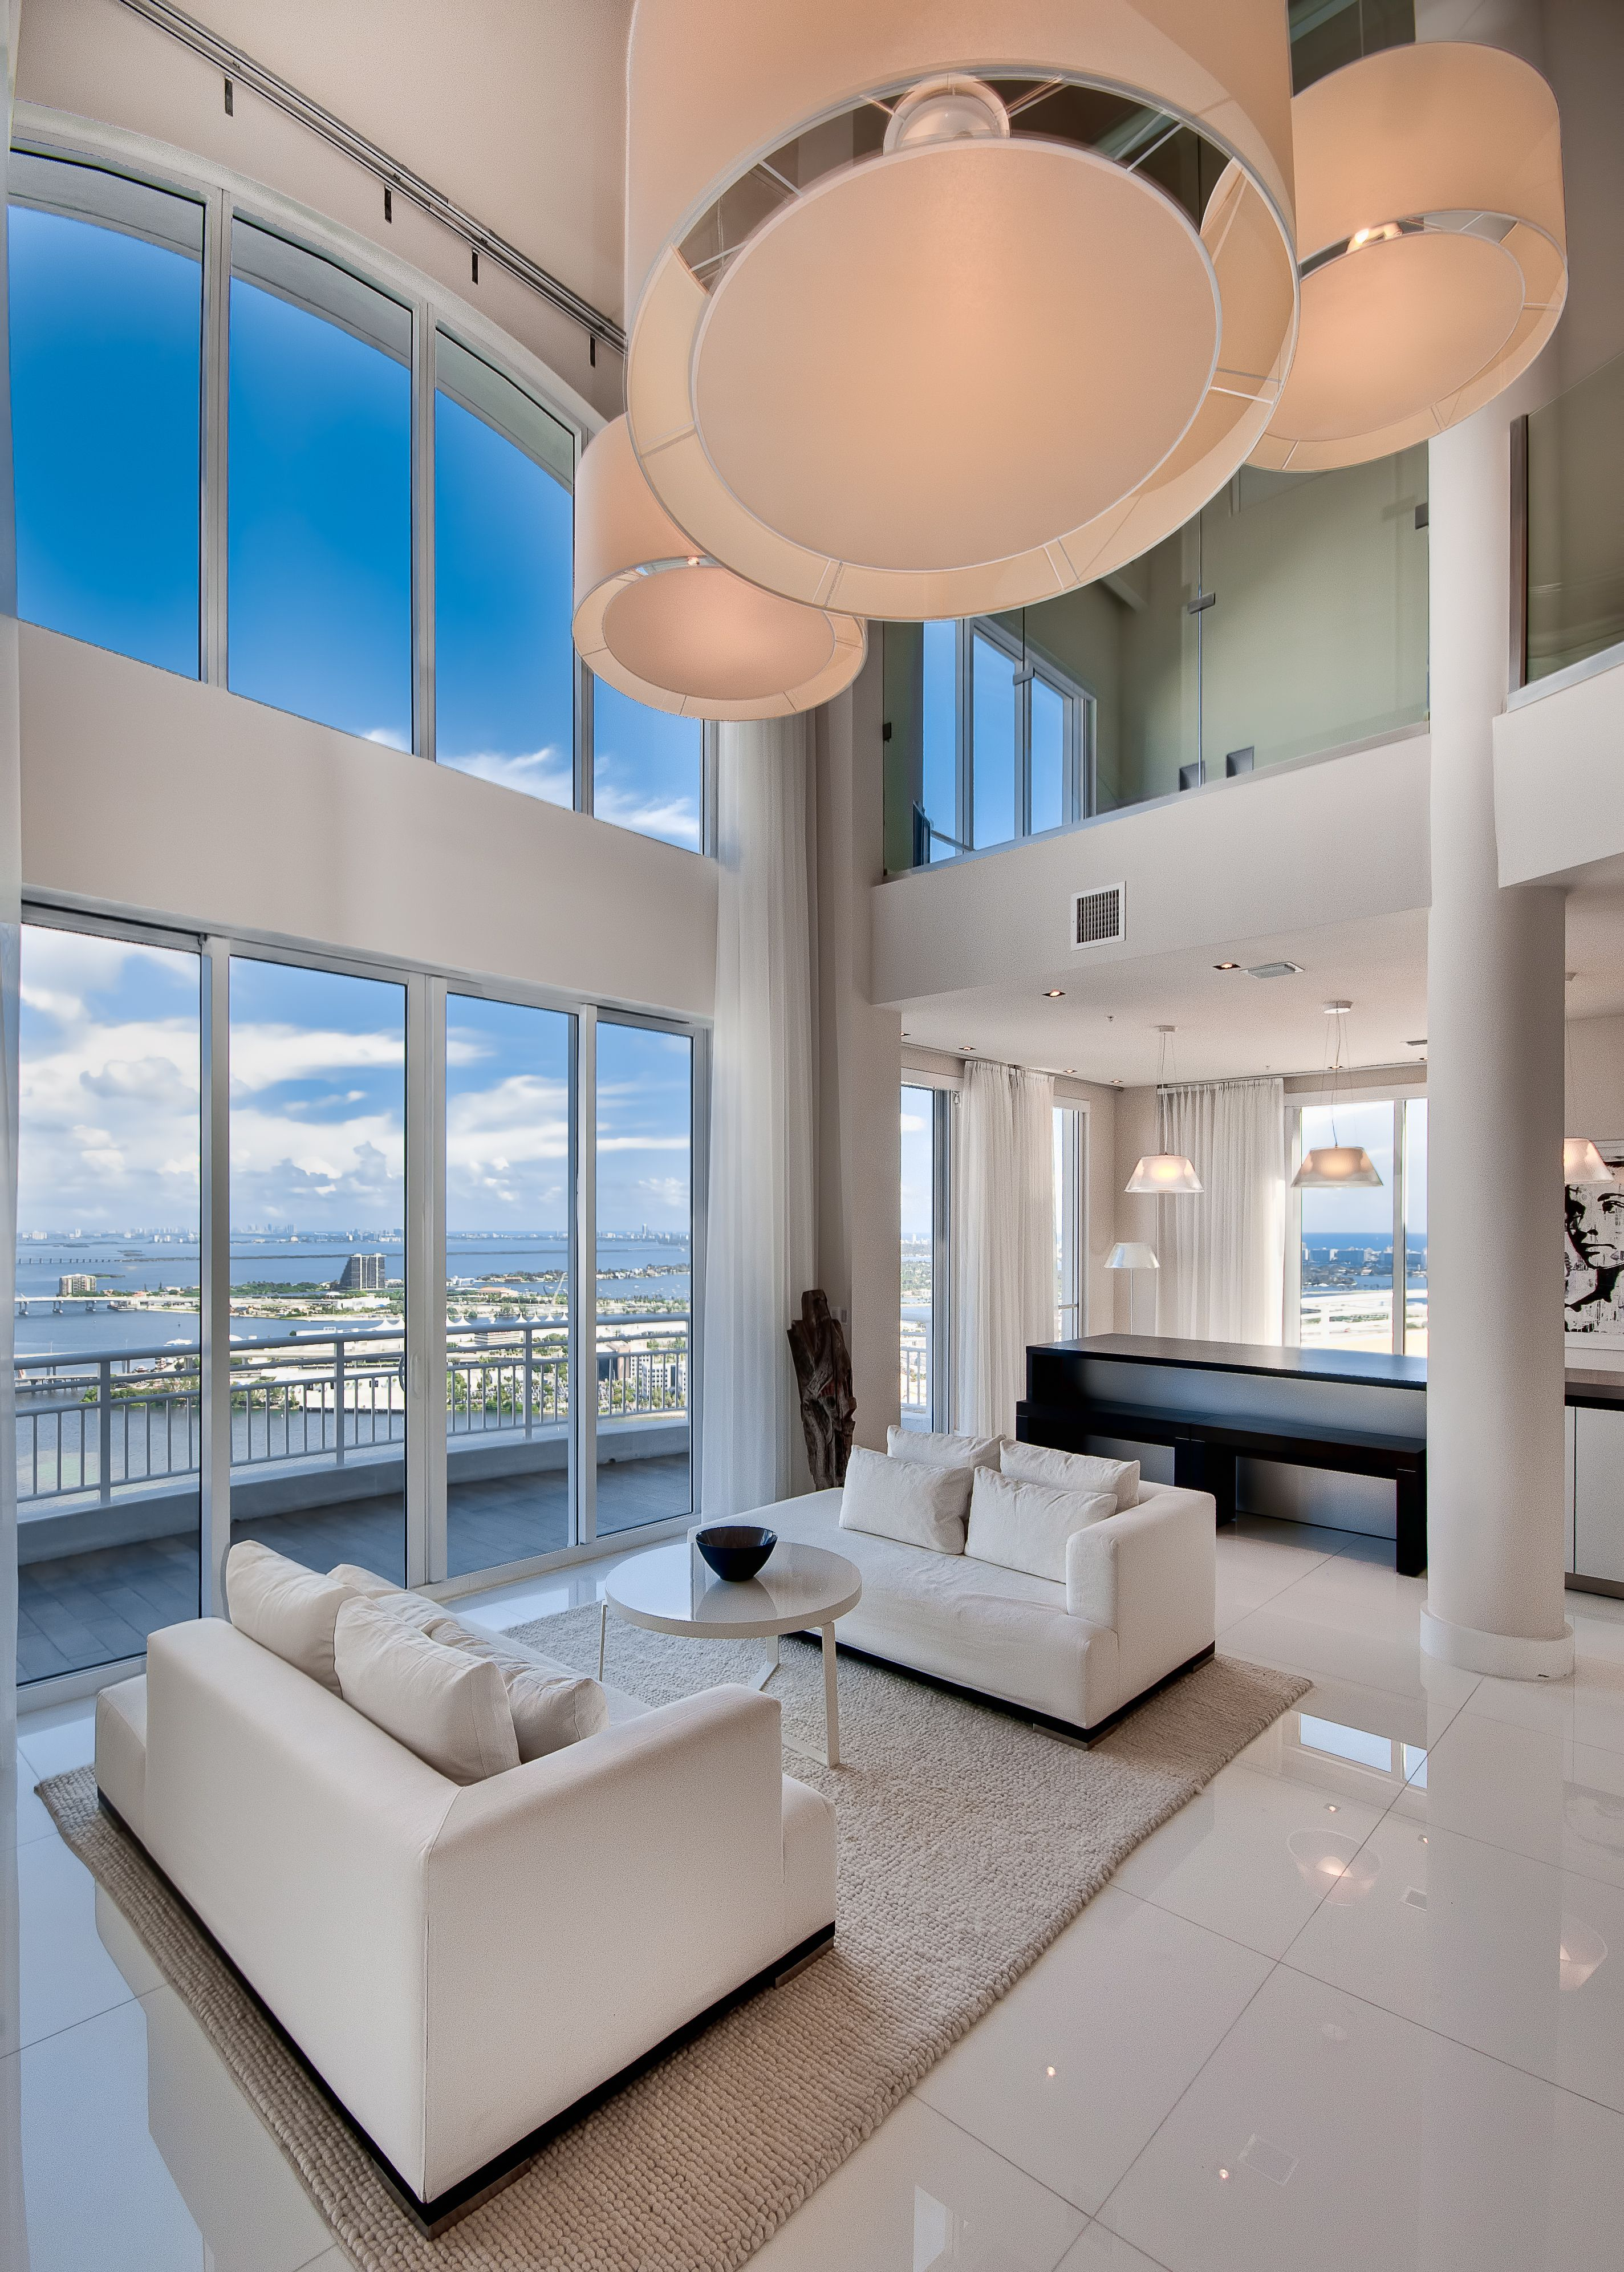 Completed Baltus project in Tequesta PH4604 #interiordesign #luxury